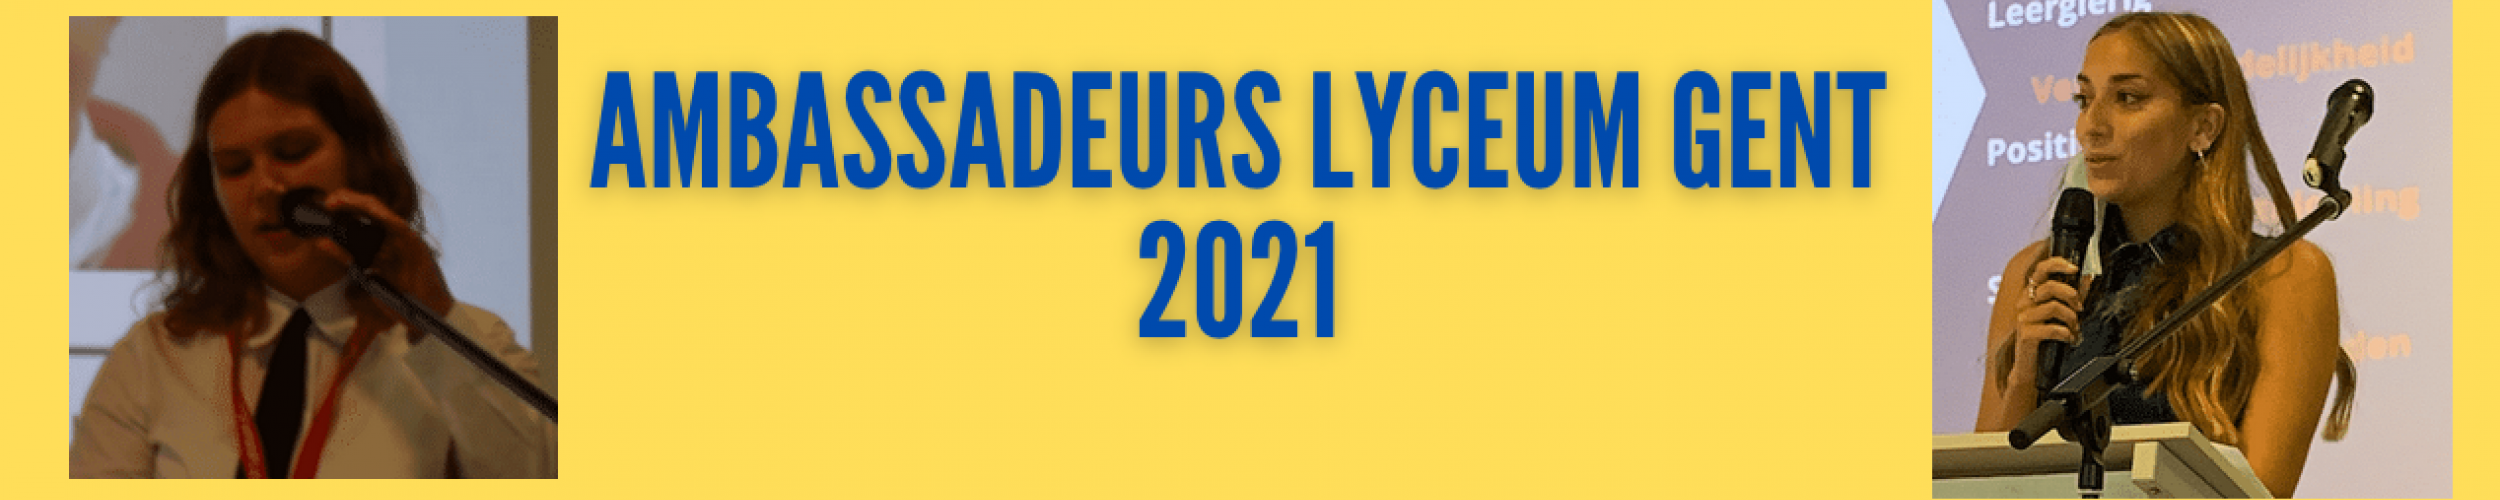 Ambassadeurs Lyceum